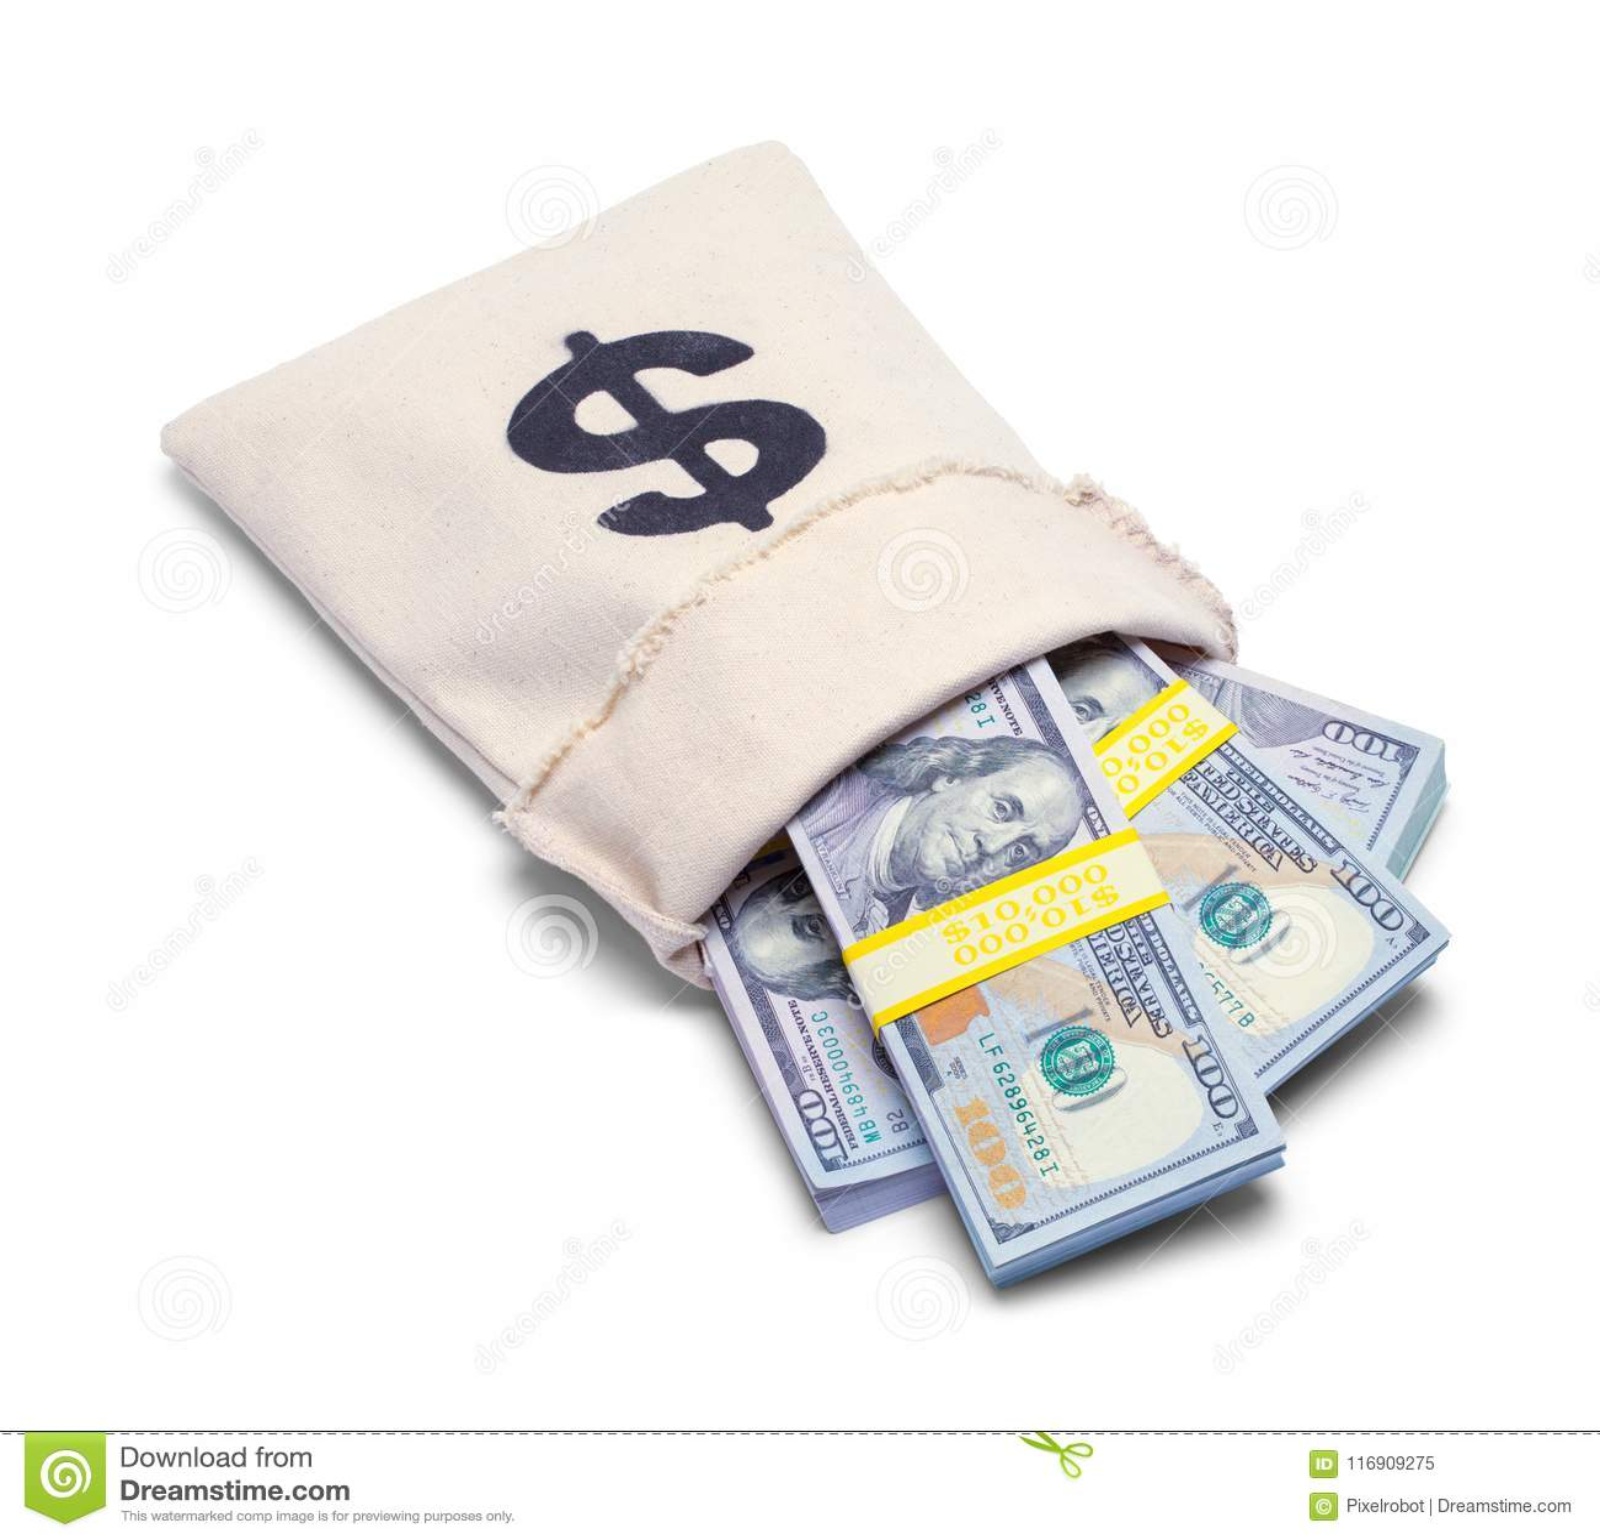 Sac Renversé D'argent Image StockDu ArgentDégrèvement OXuPkiZ